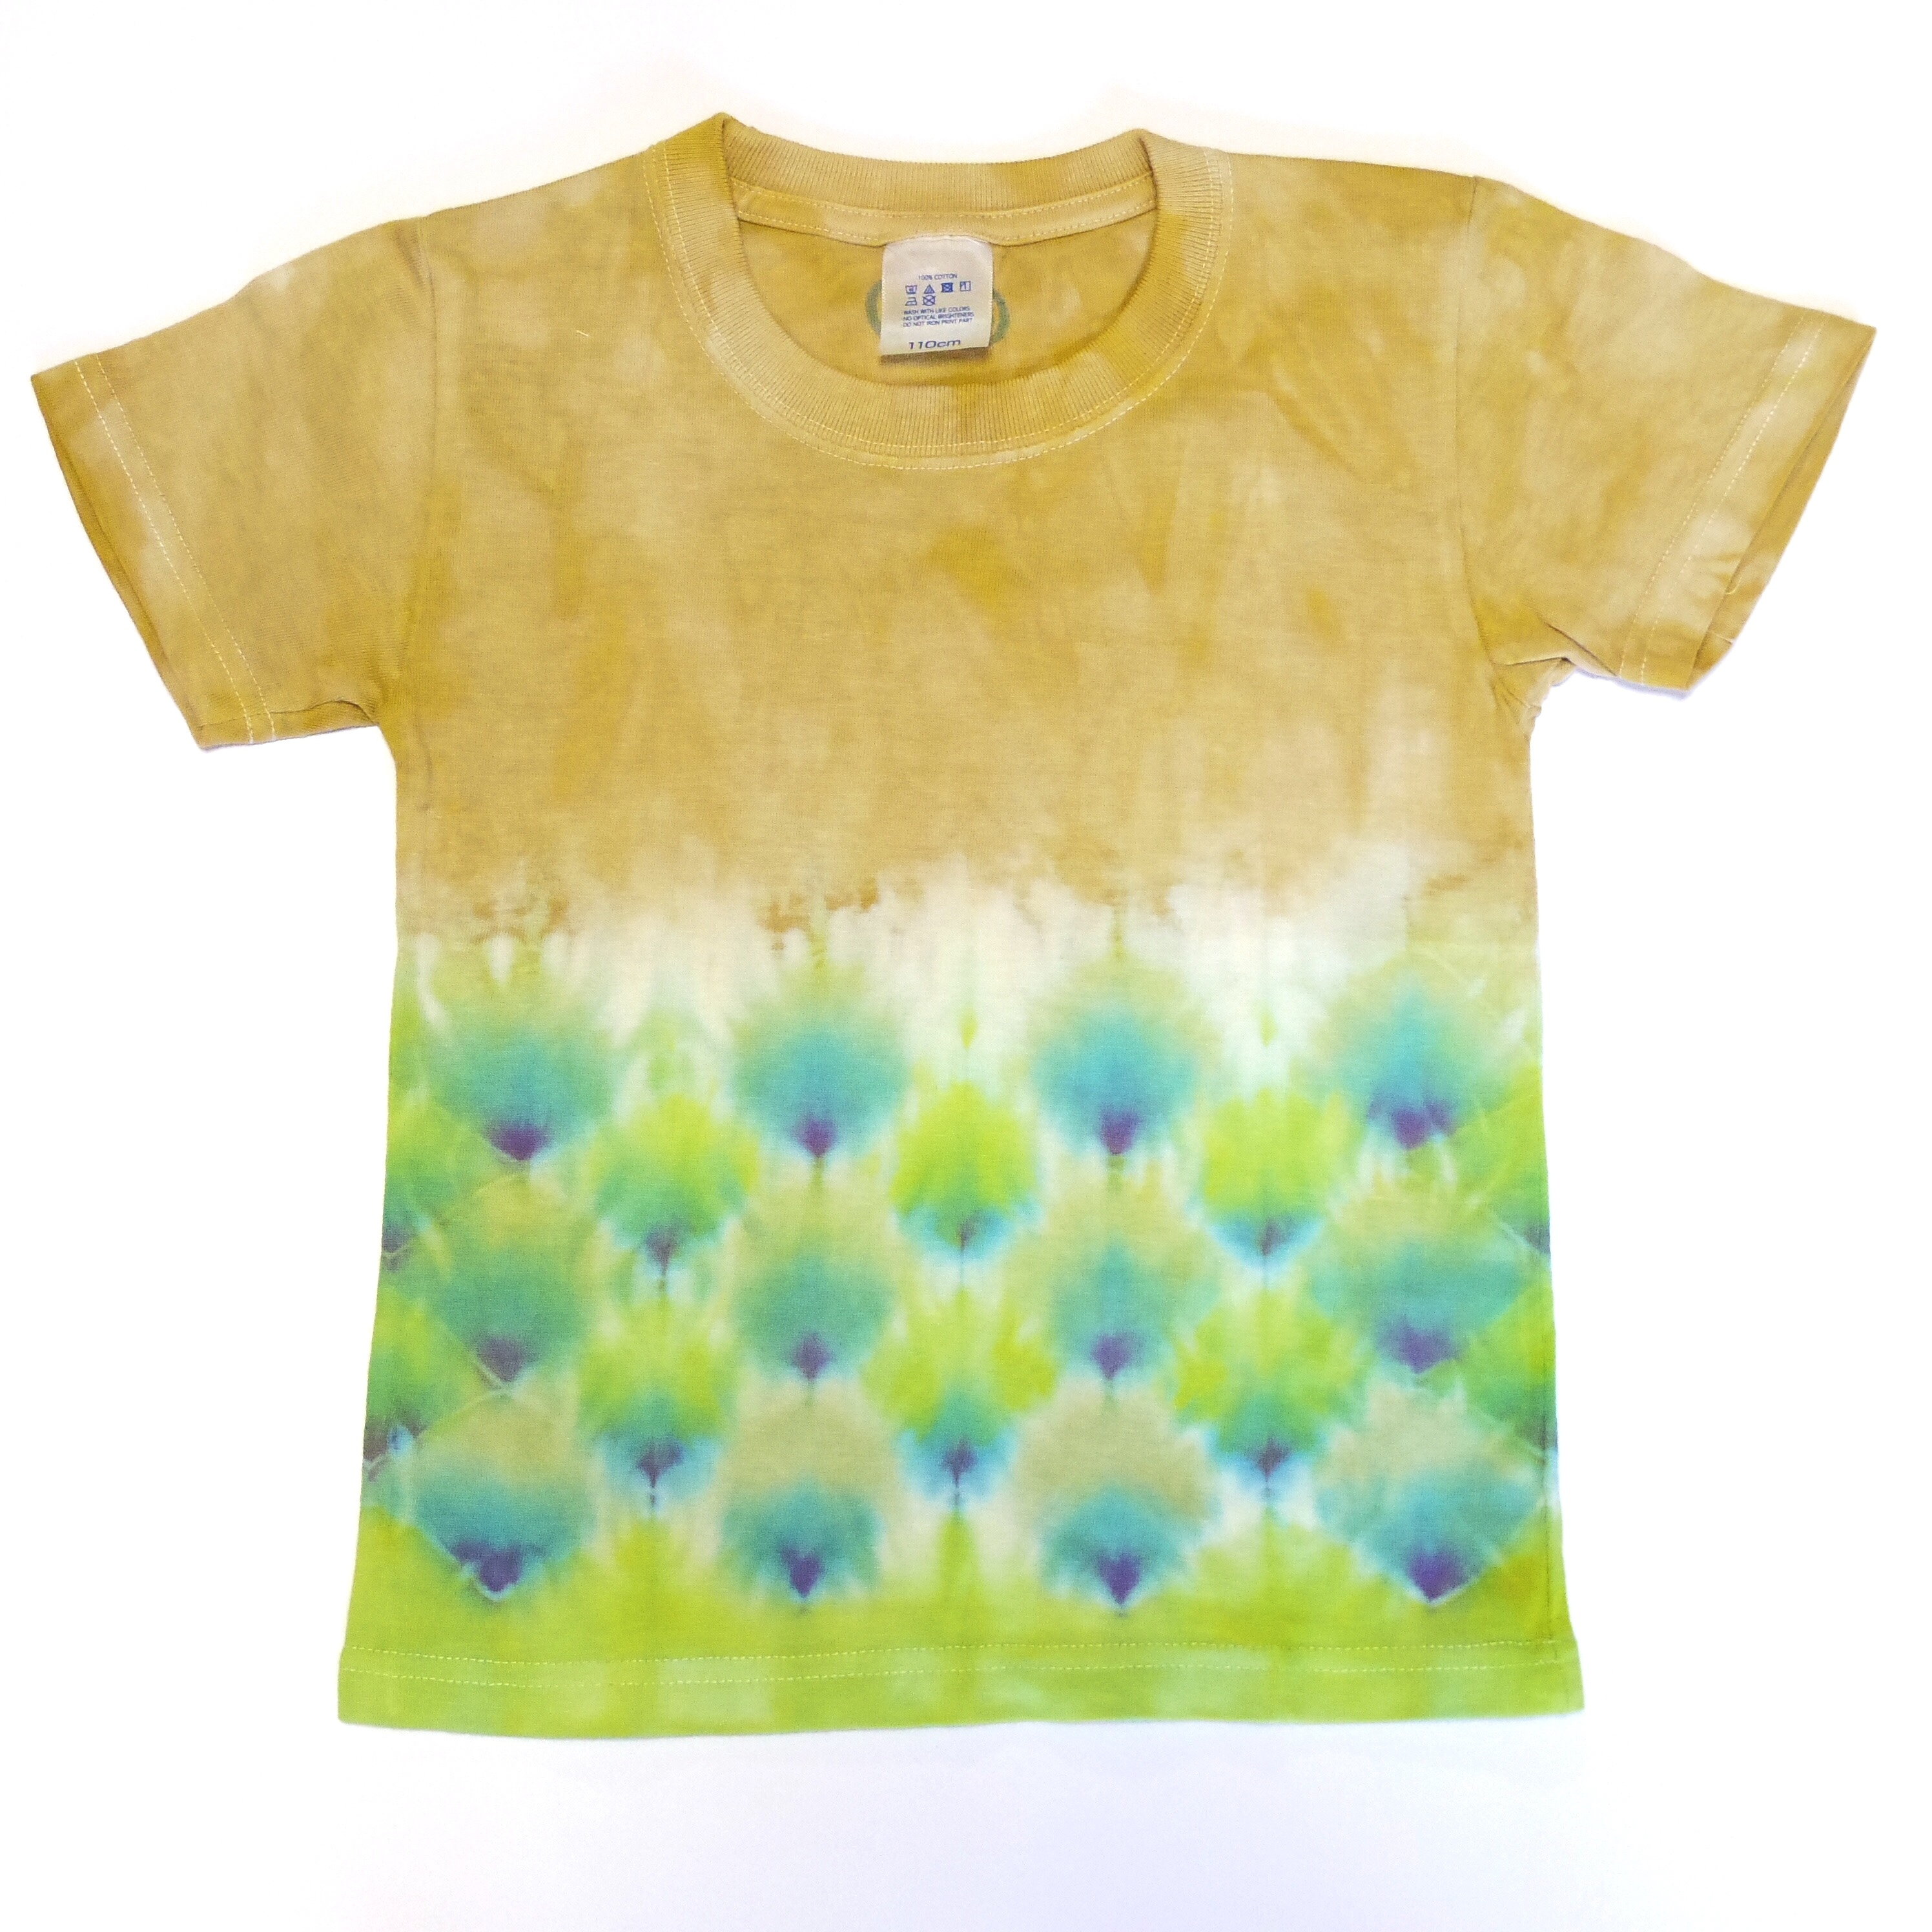 TKHOME FACTORY ウロコ染め タイダイ キッズTシャツ 110cm